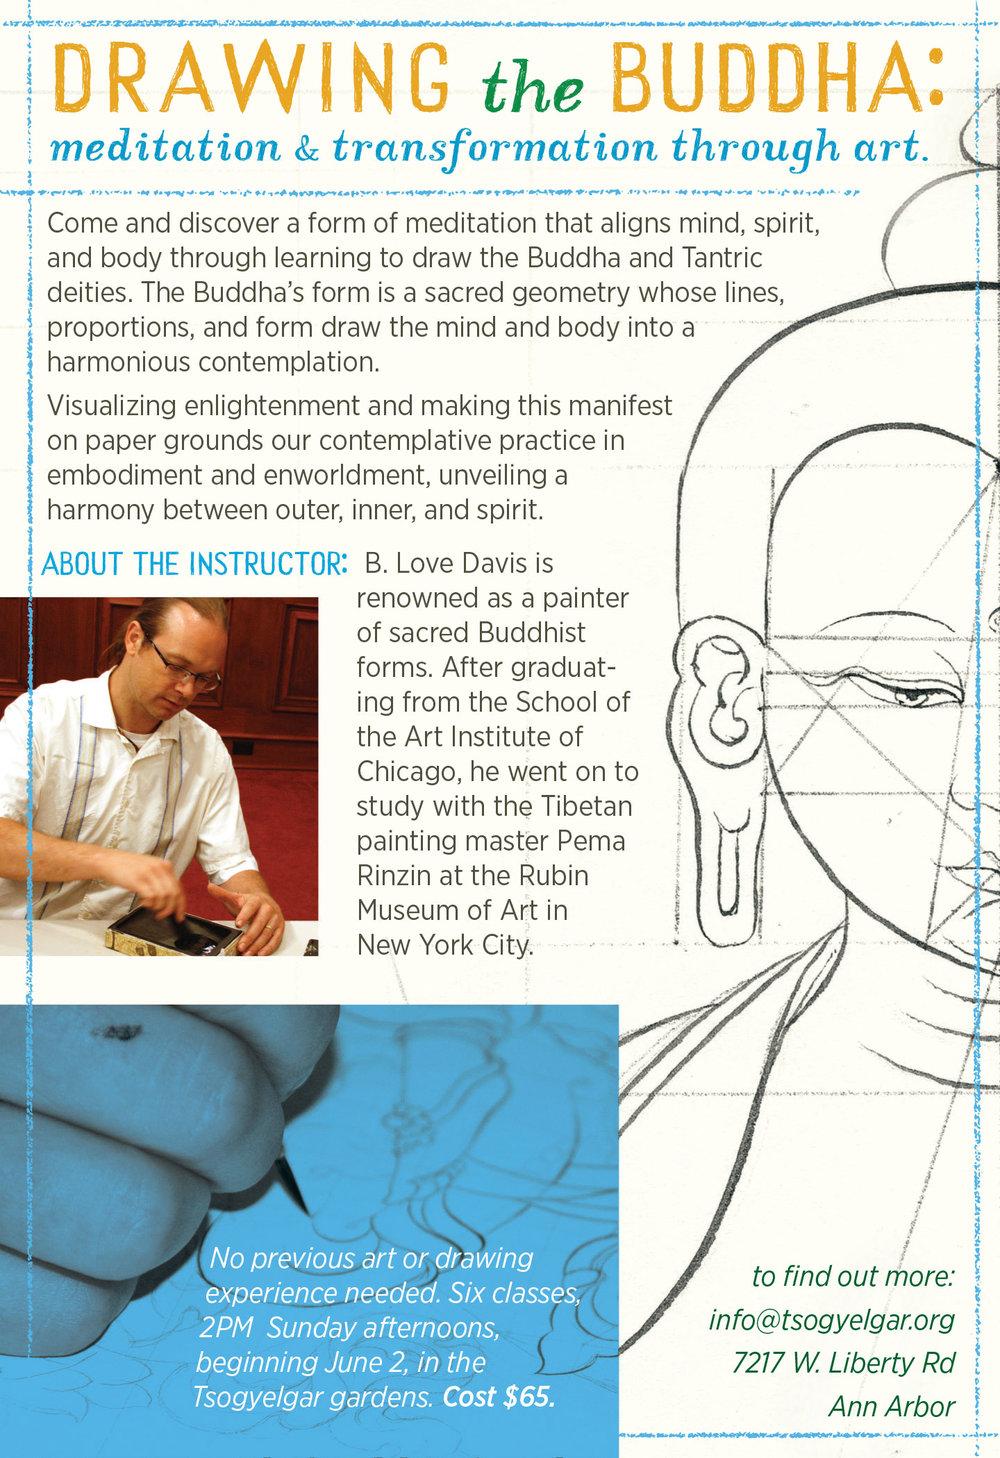 Tsogyelgar-quarter-page-draw-Buddha-03.jpg